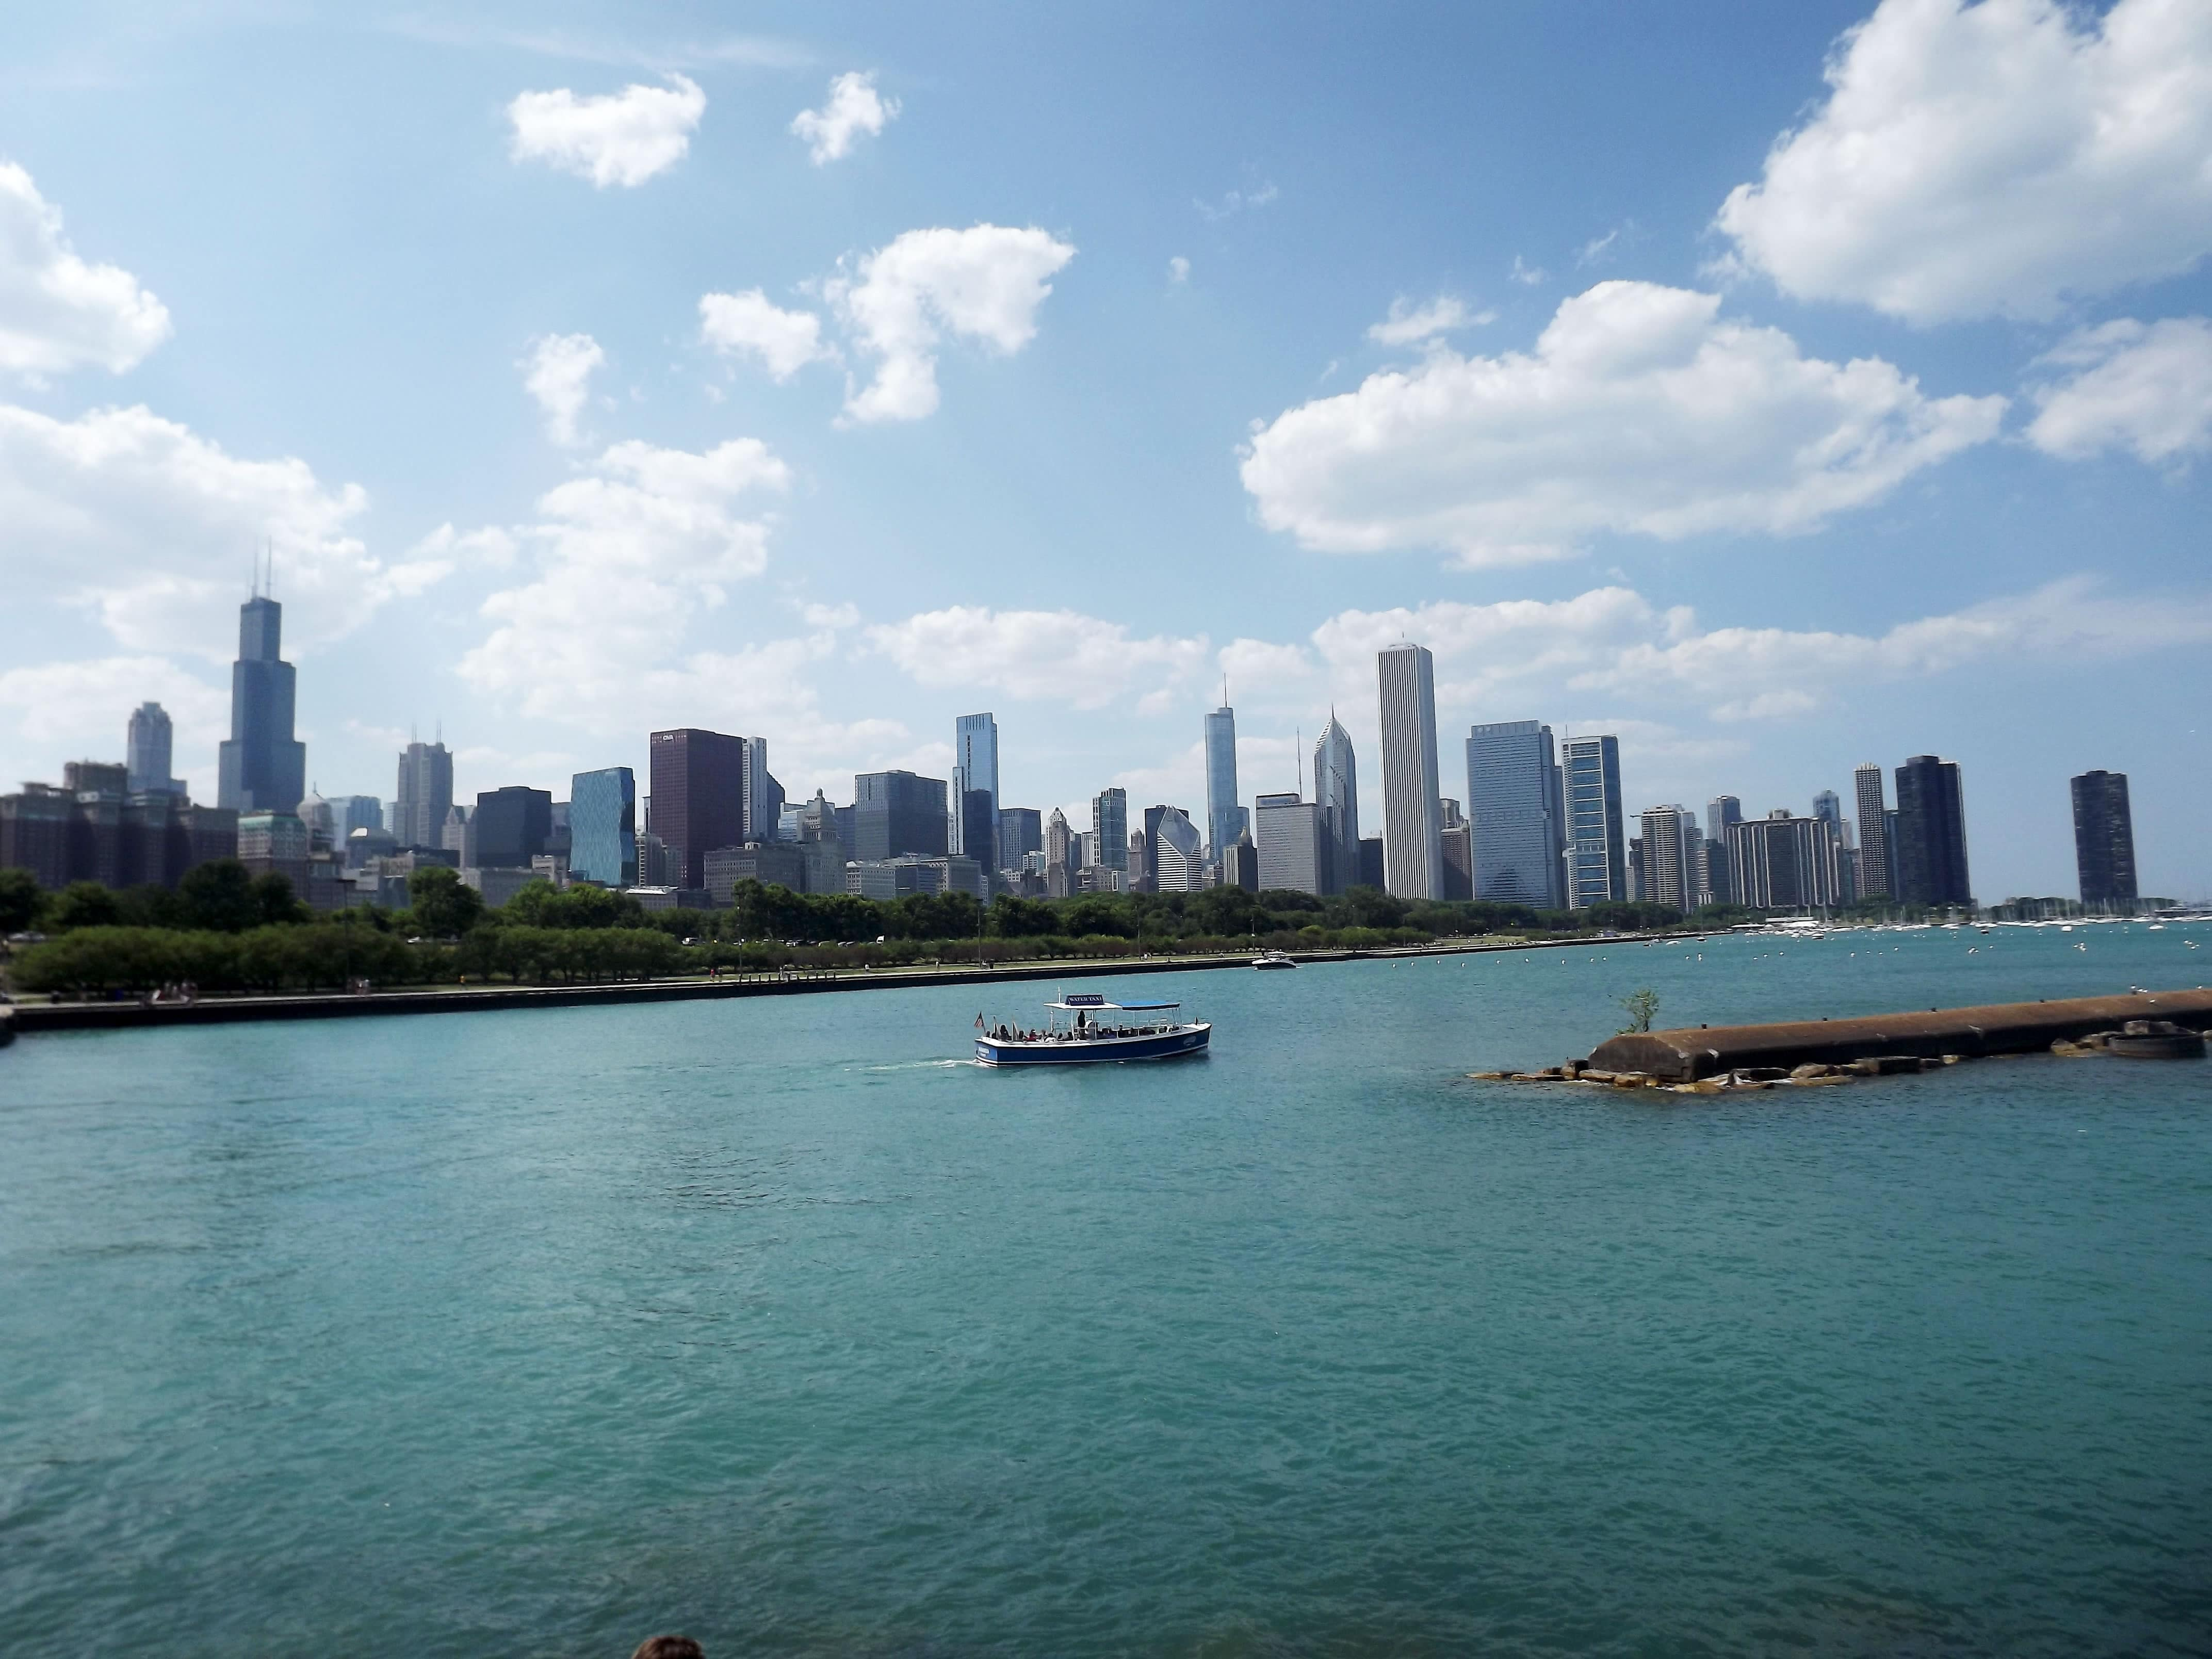 chicago en une journée